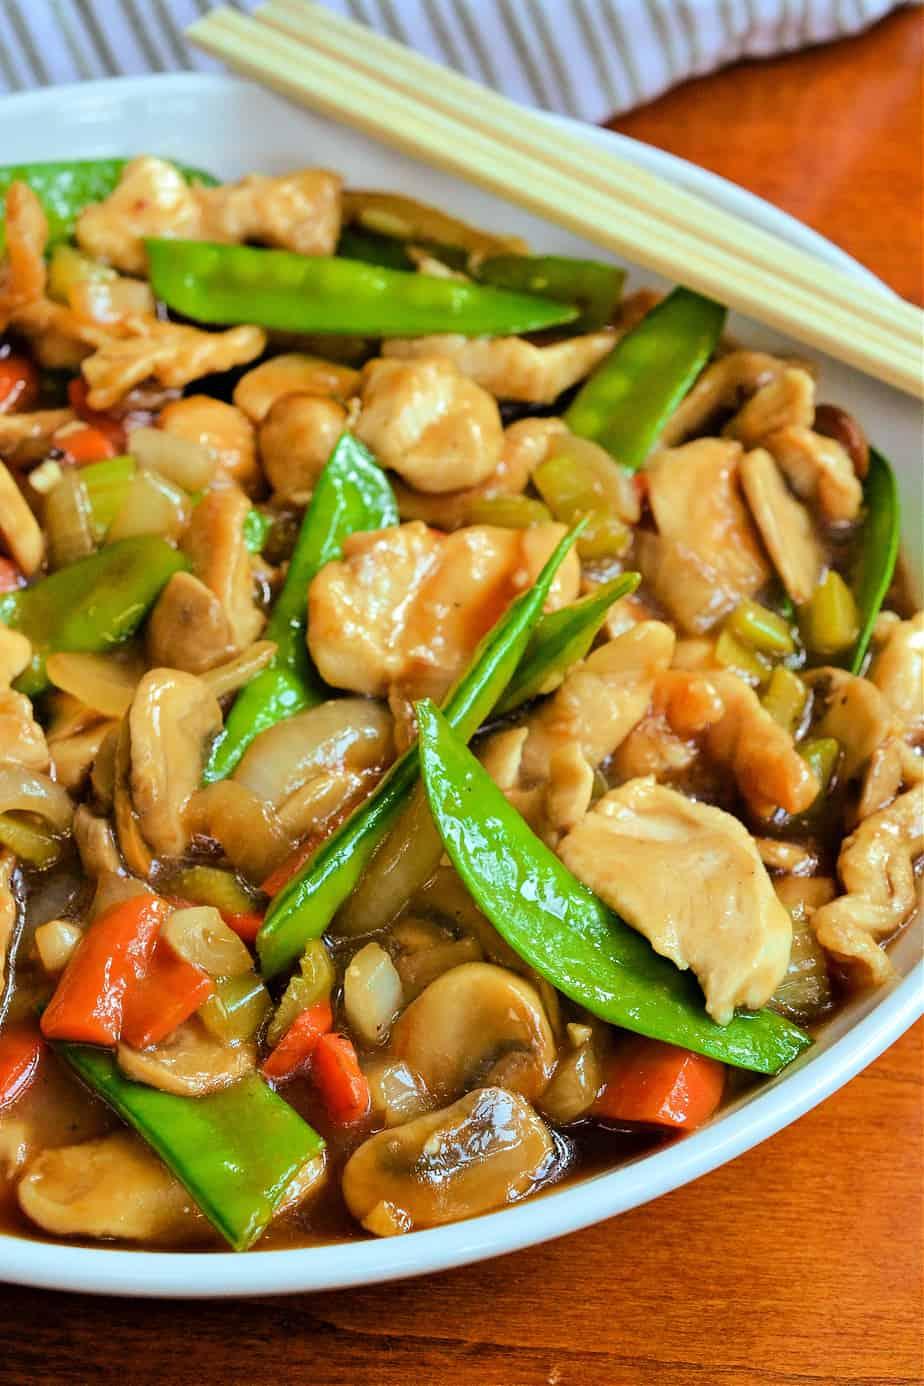 A skillet full of chicken chop suey.